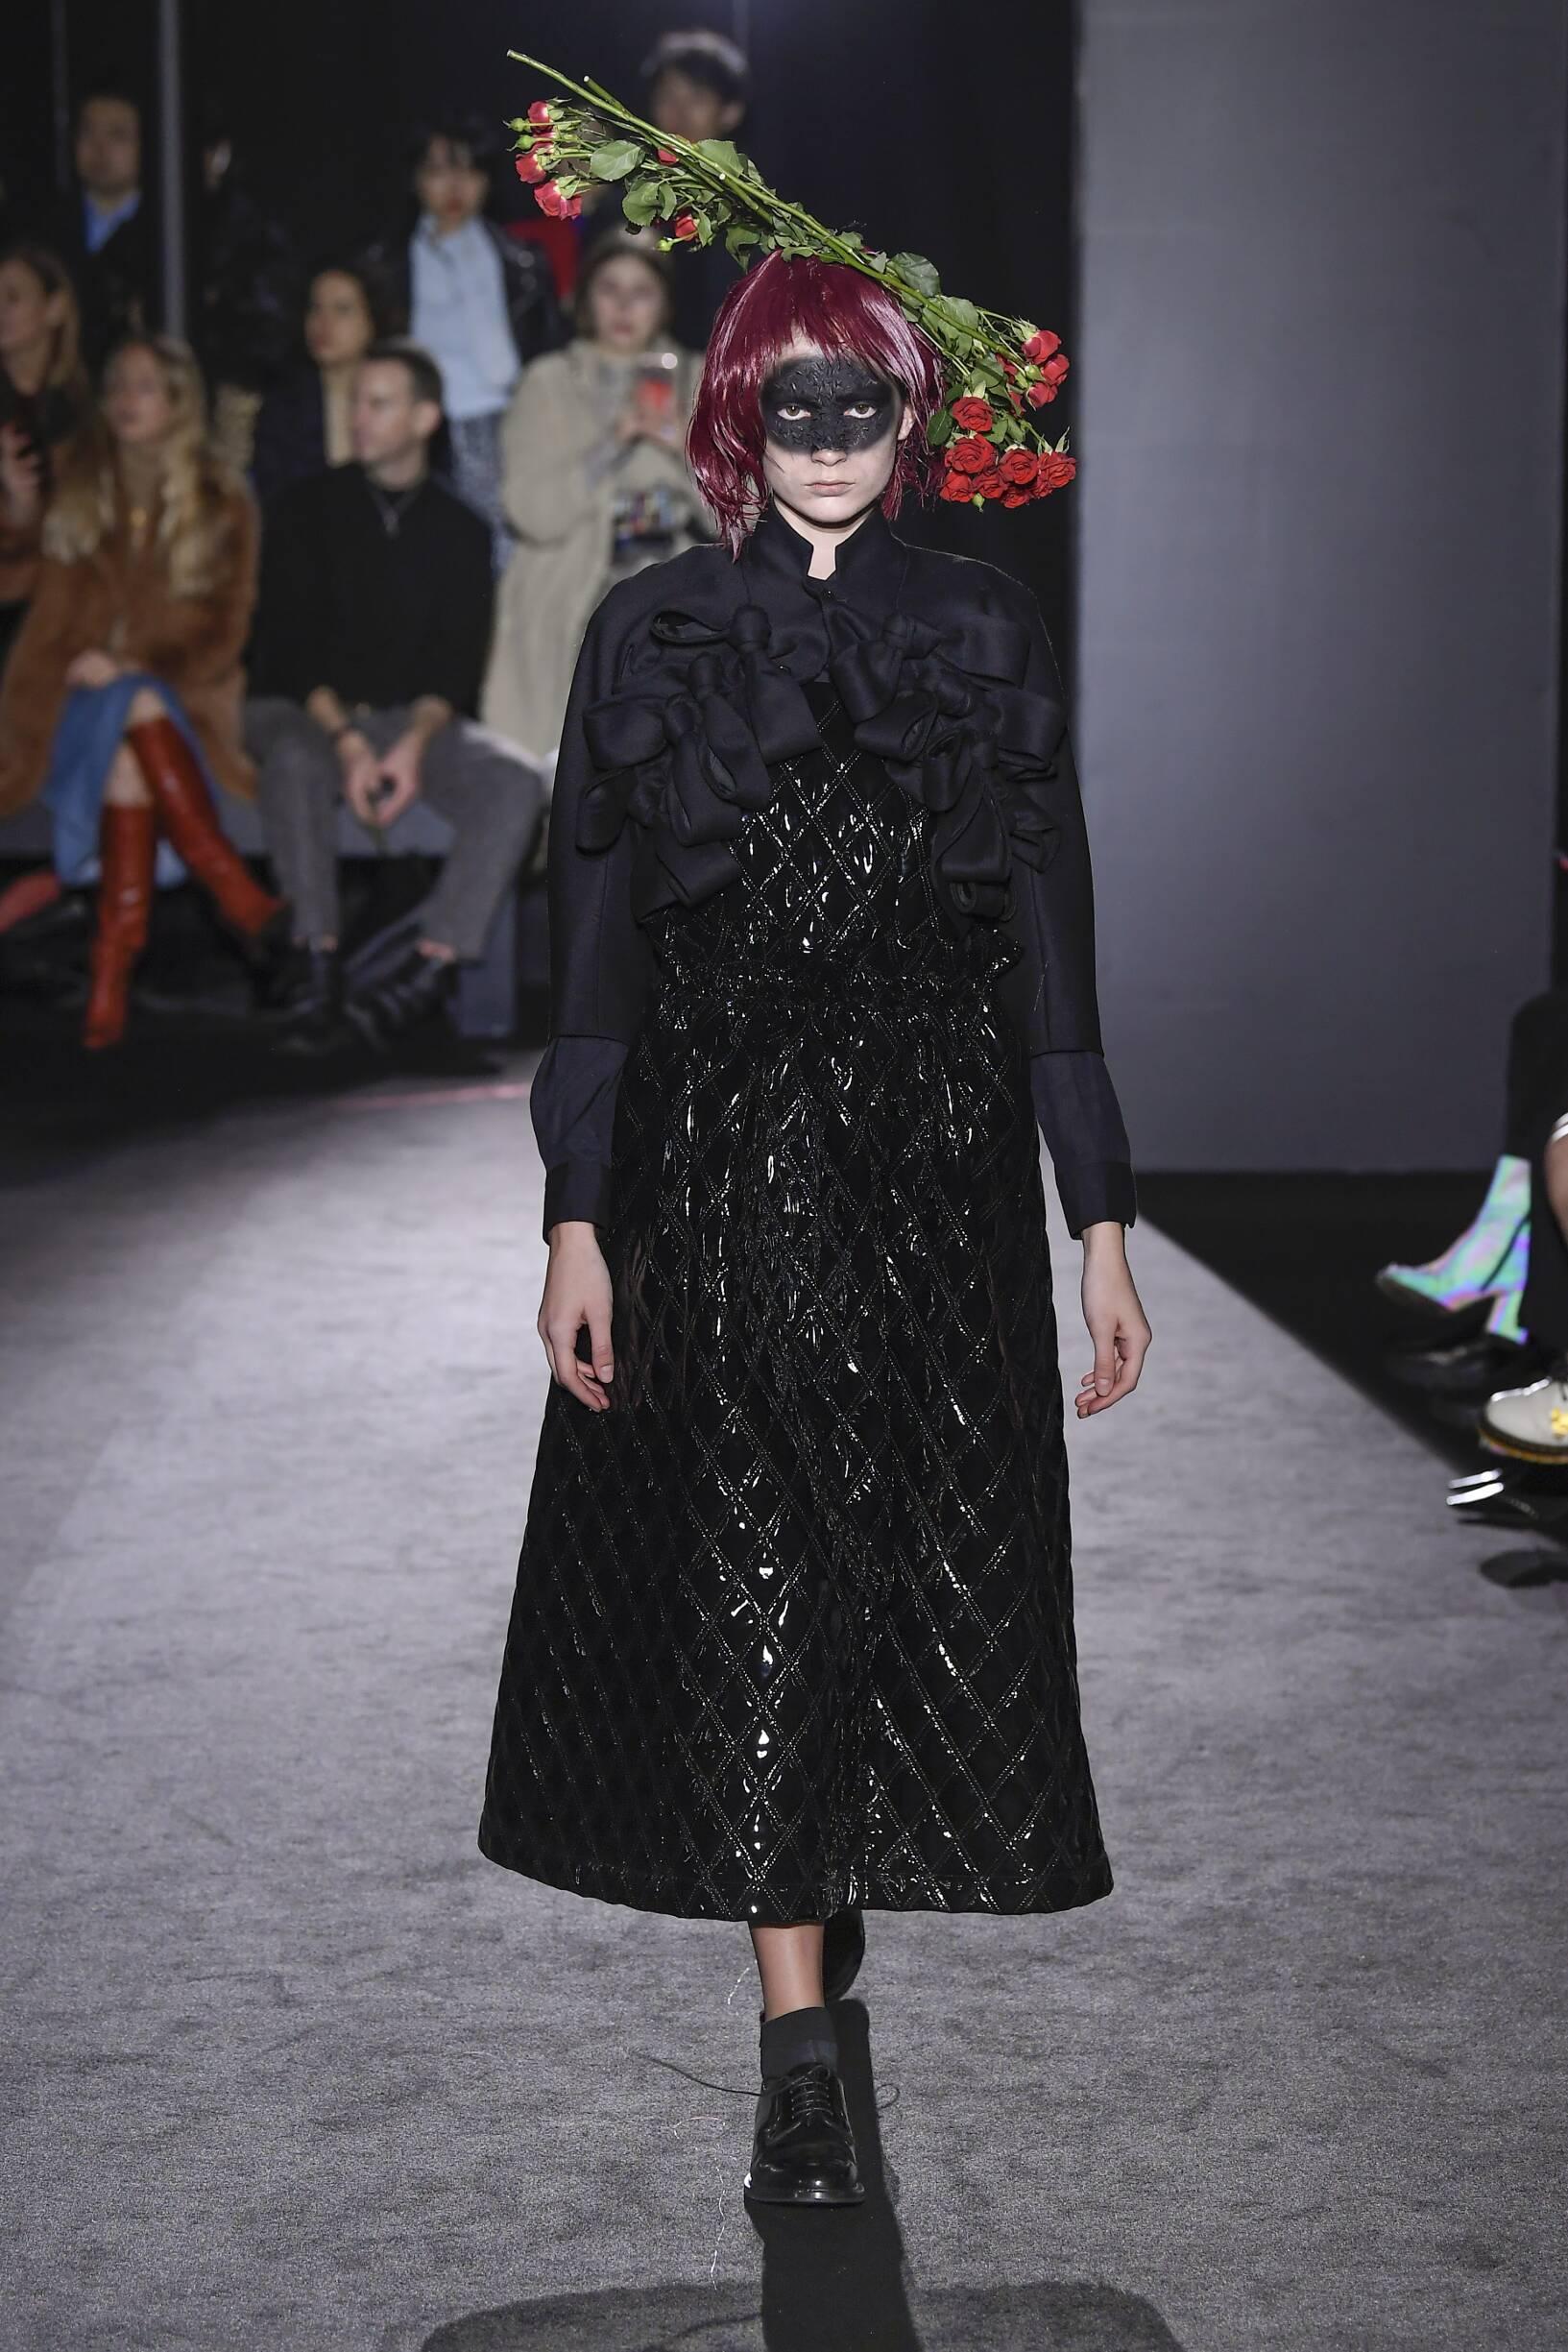 Fashion Show Woman Model Noir Kei Ninomiya Catwalk